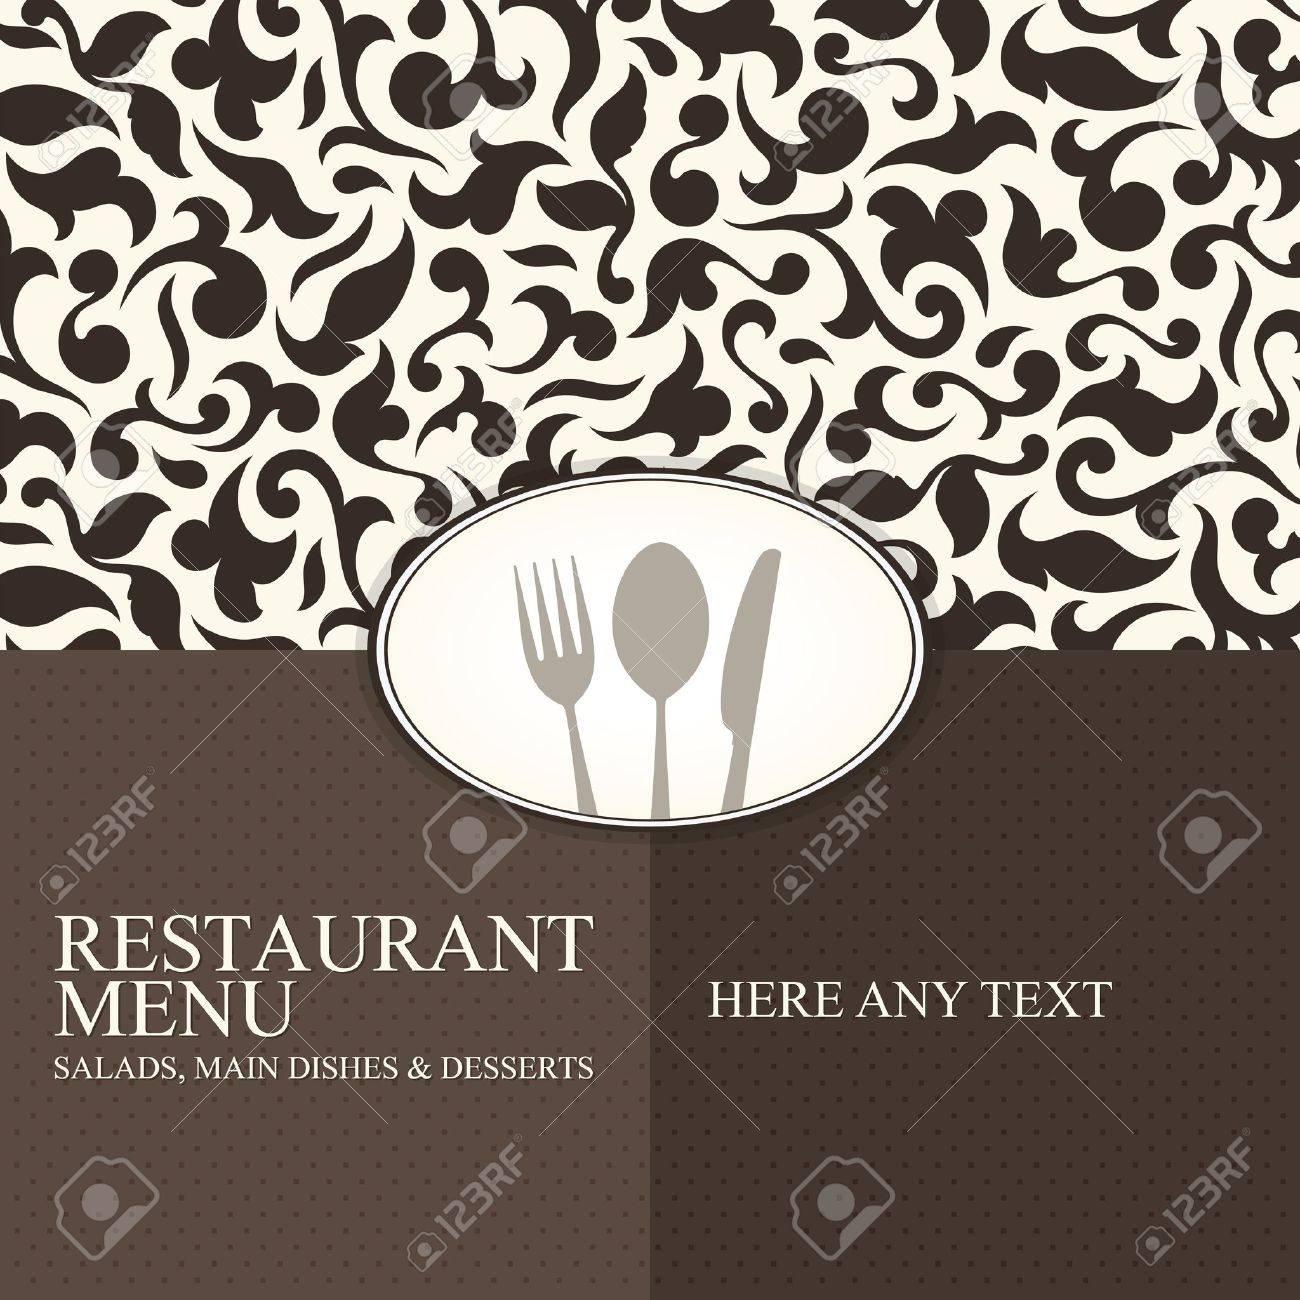 Restaurant menu design Stock Vector - 12992141